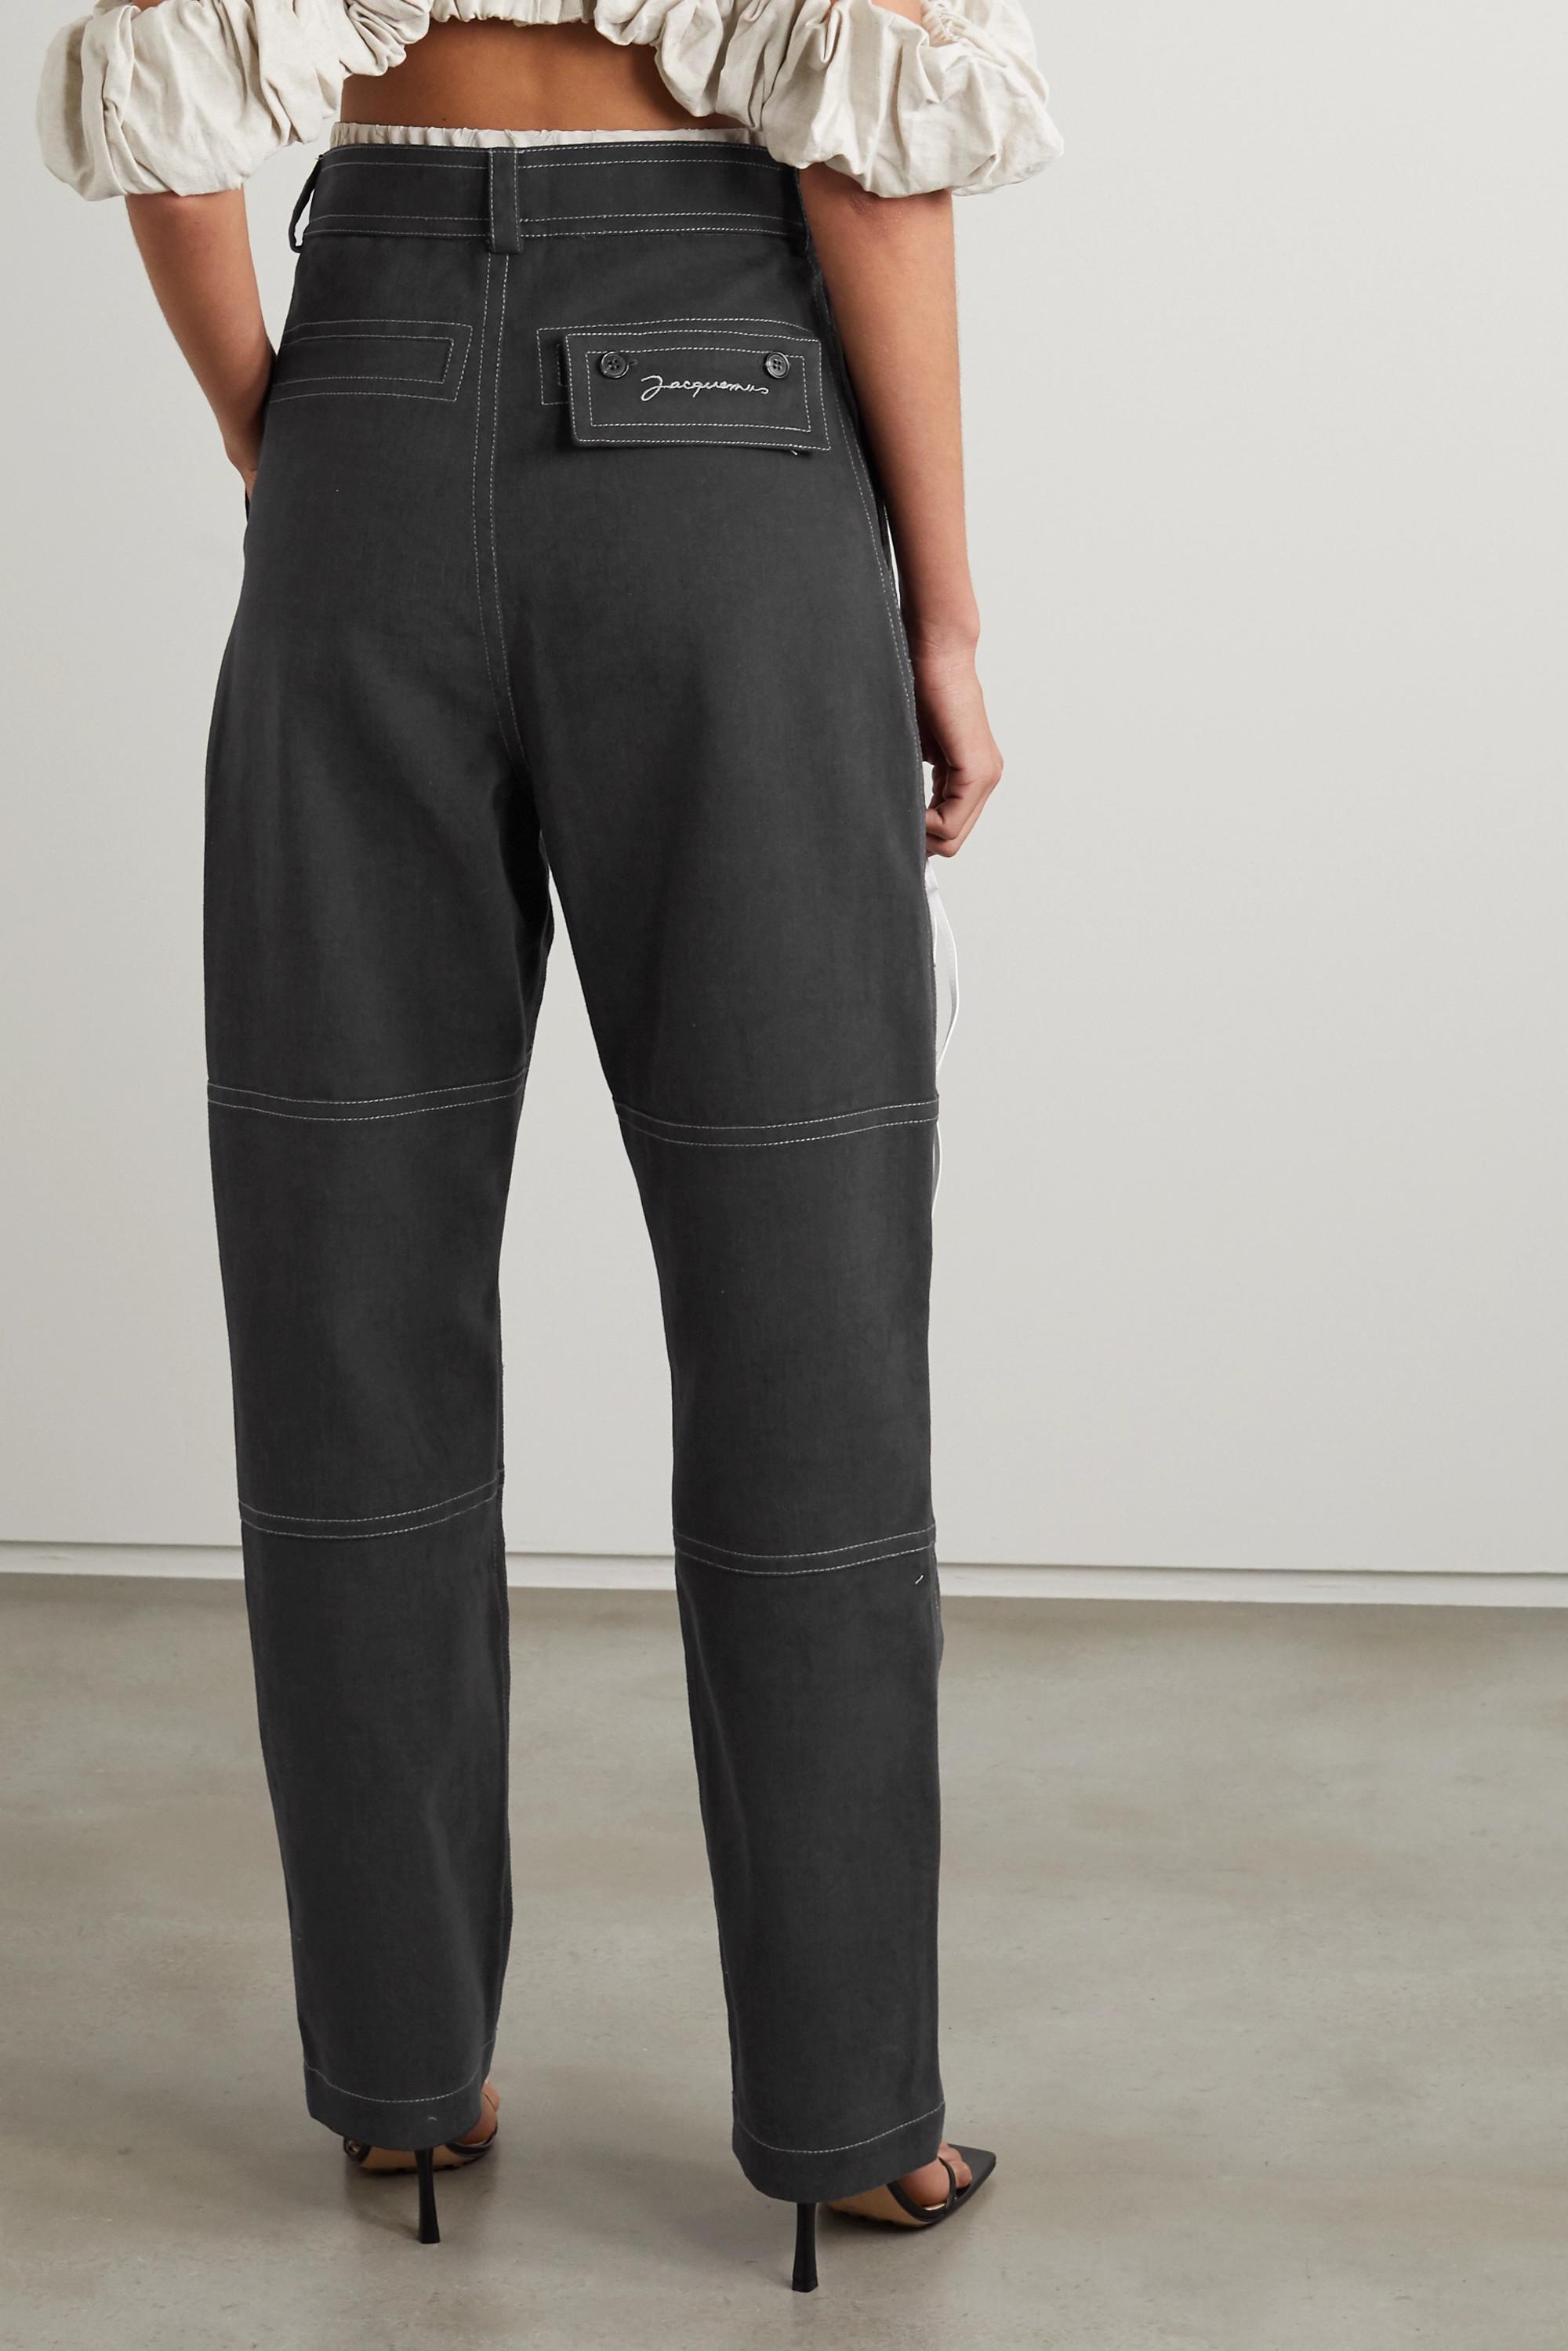 Jacquemus Felix mehrlagige hoch sitzende Jeans